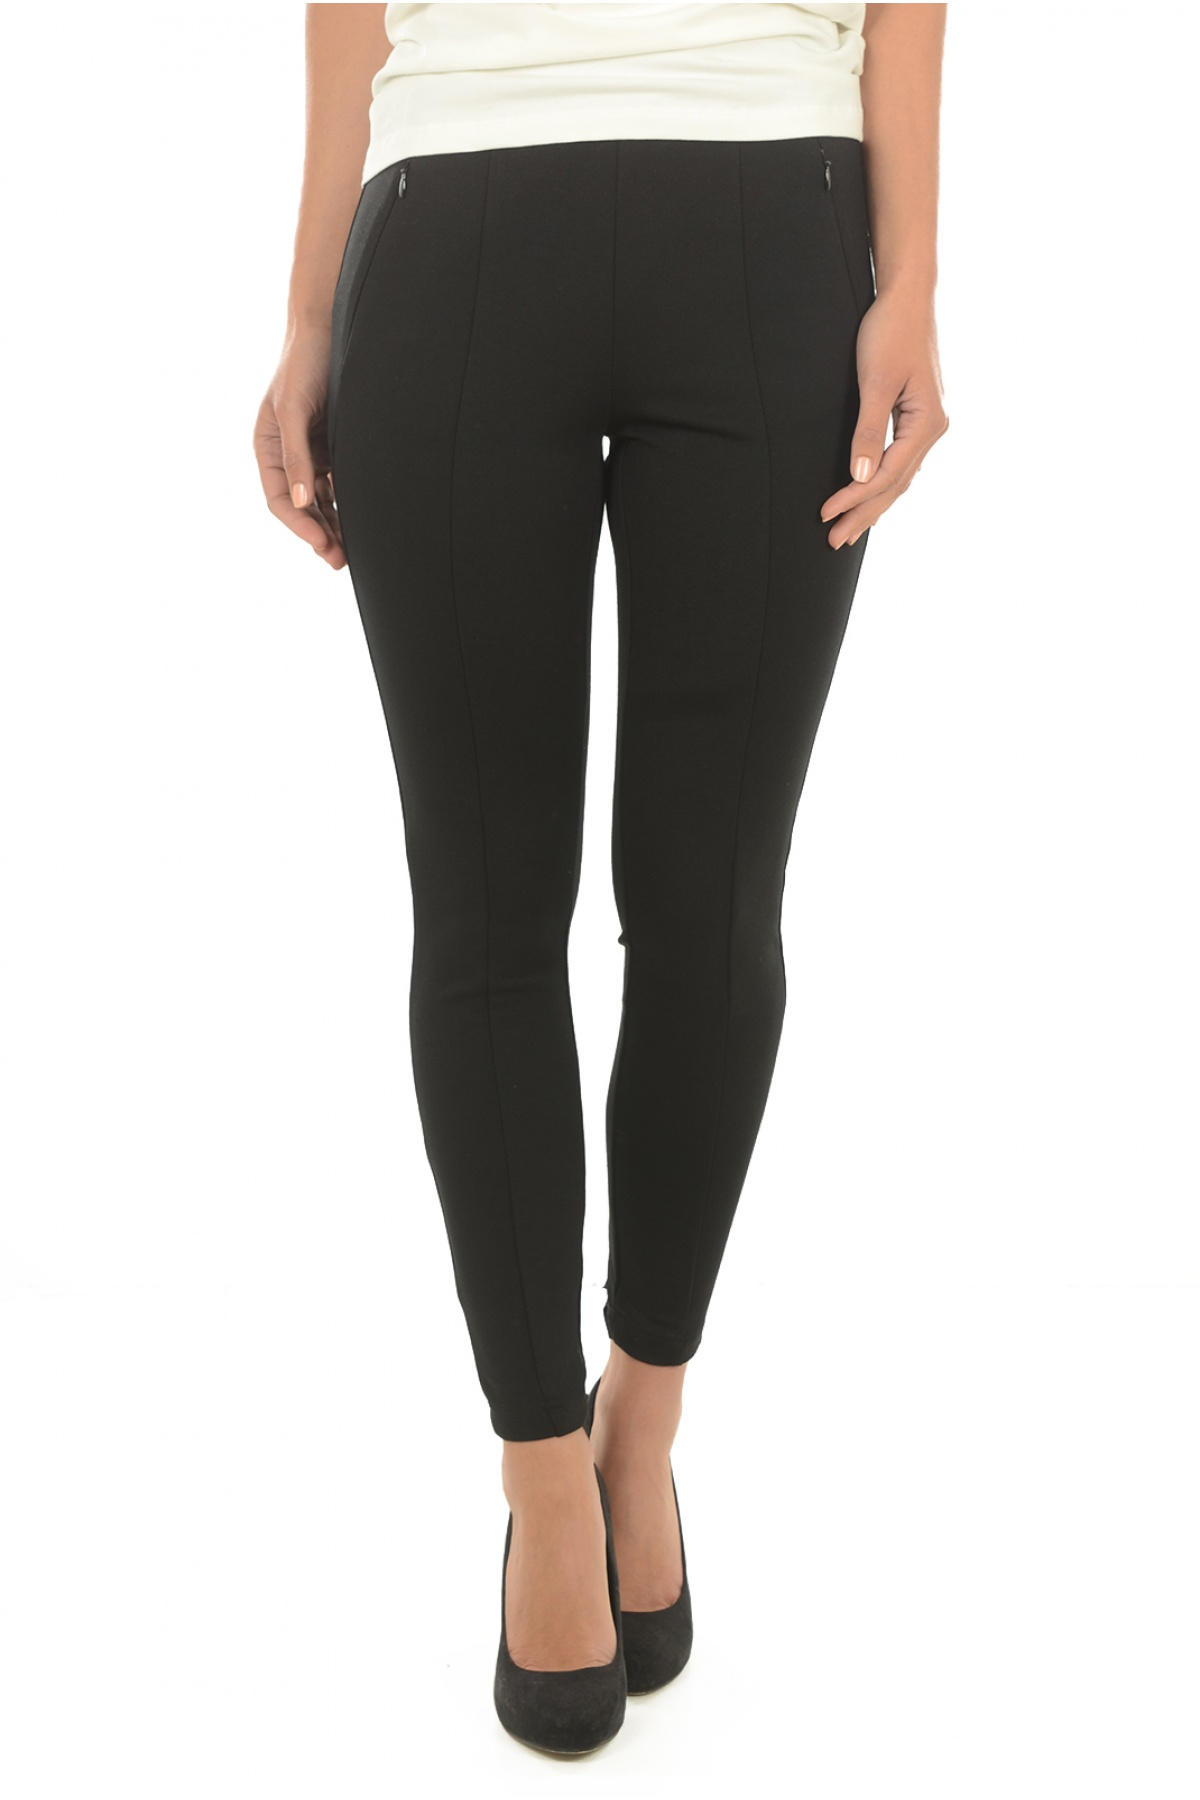 Pantalons Morgan Femme Xs,s,m,l